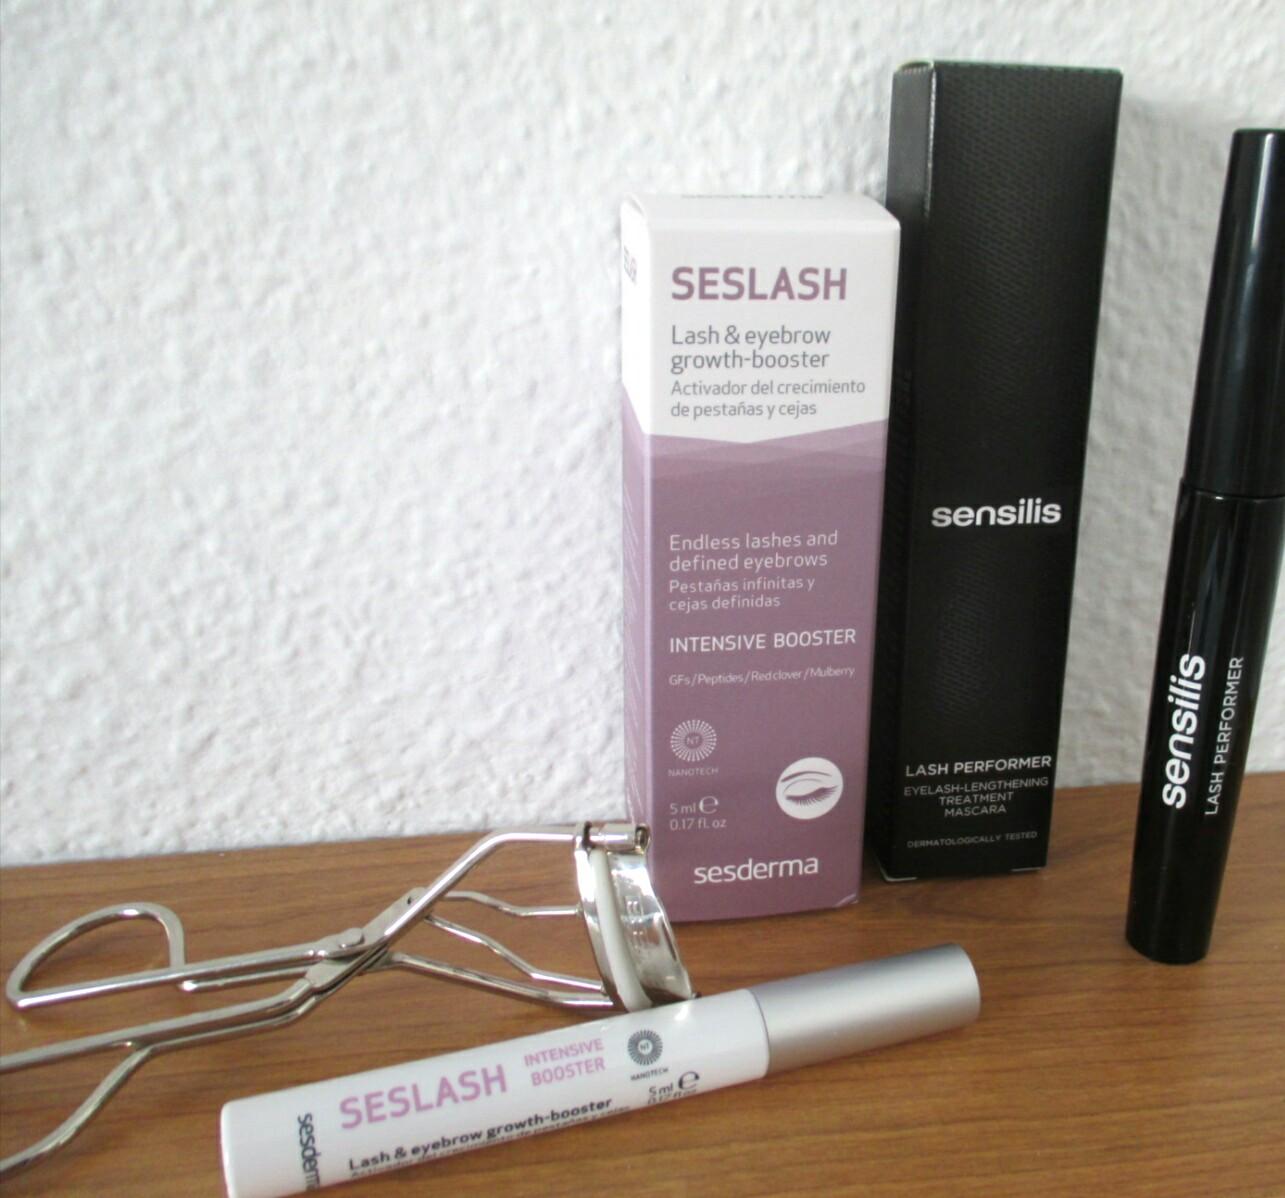 Tratamiento Sesderma seslash serum